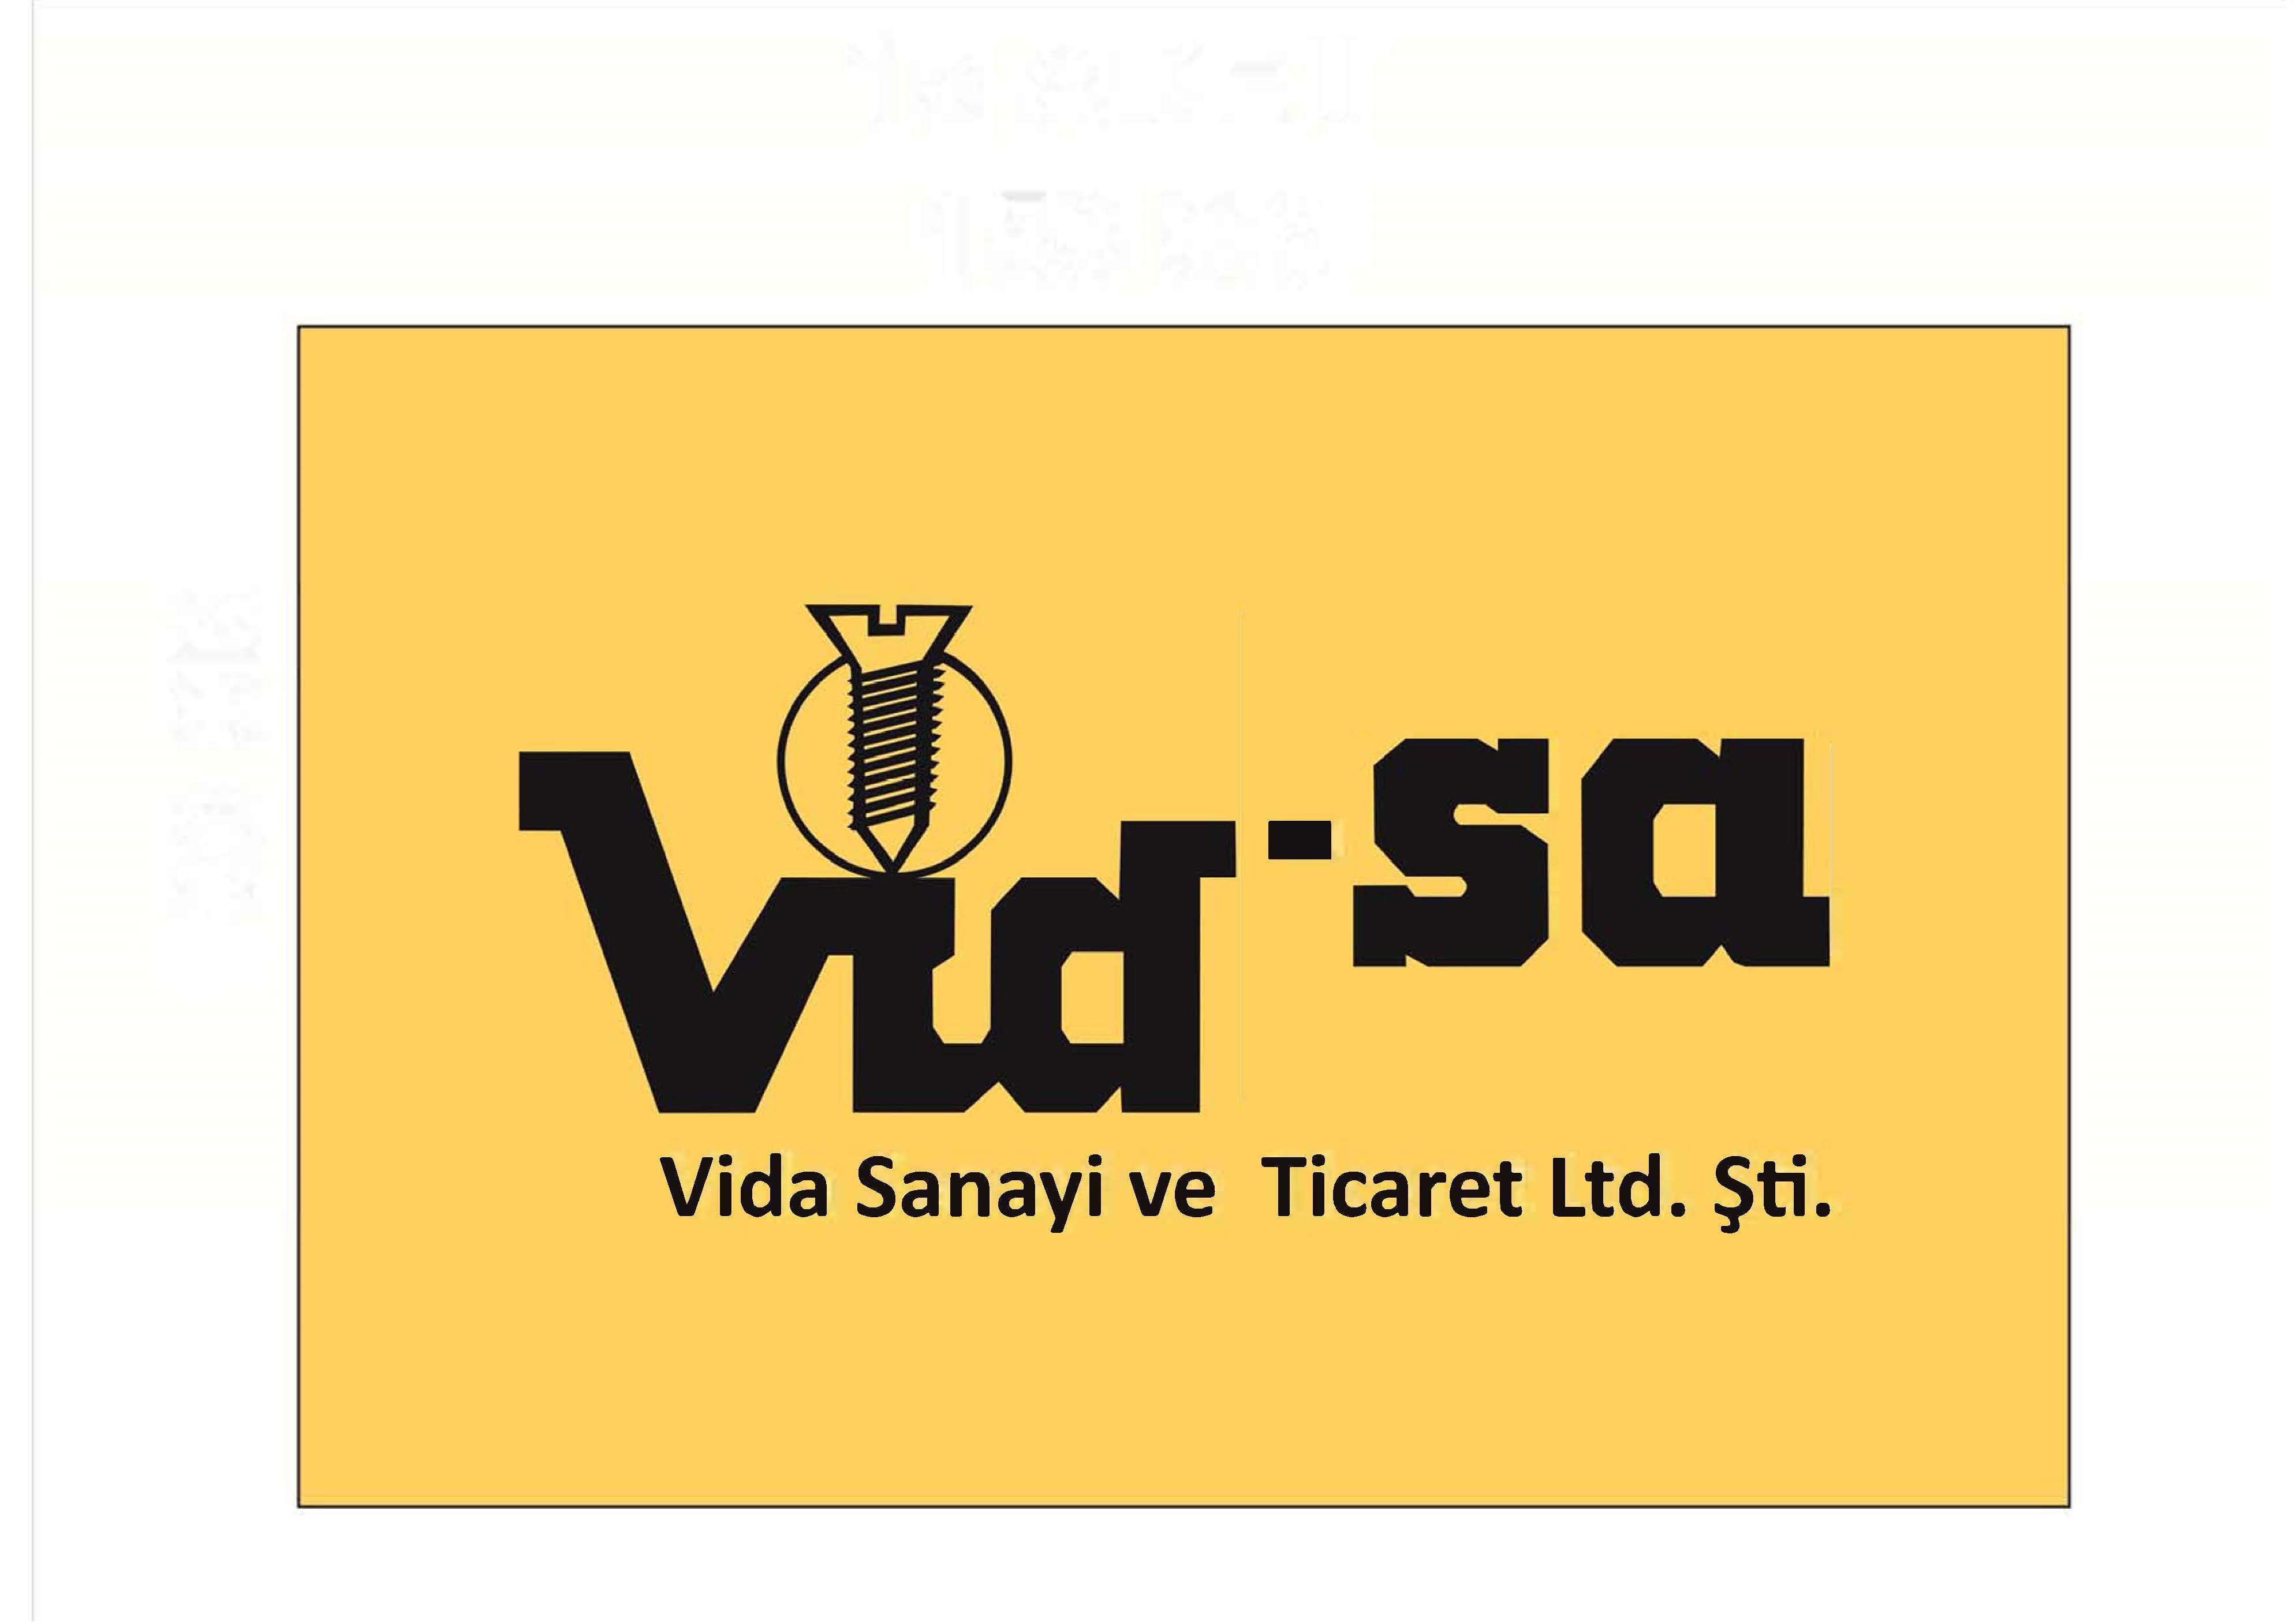 Vid-sa Vida Sanayi ve Ticaret Ltd Şti.